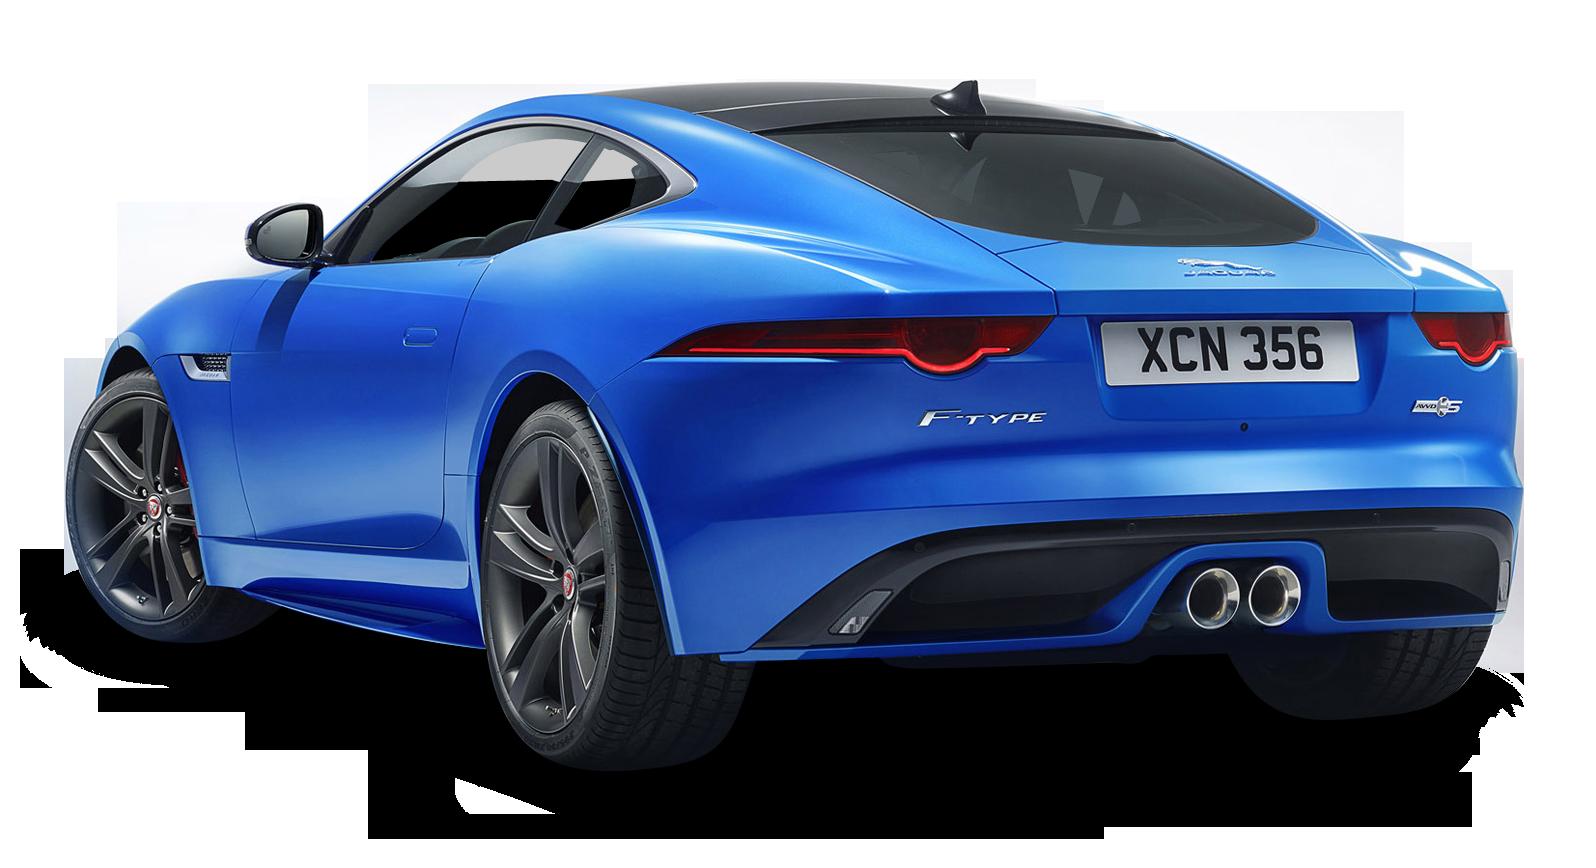 2018 Jaguar F Type >> Blue Jaguar F TYPE Back View Car PNG Image - PurePNG | Free transparent CC0 PNG Image Library